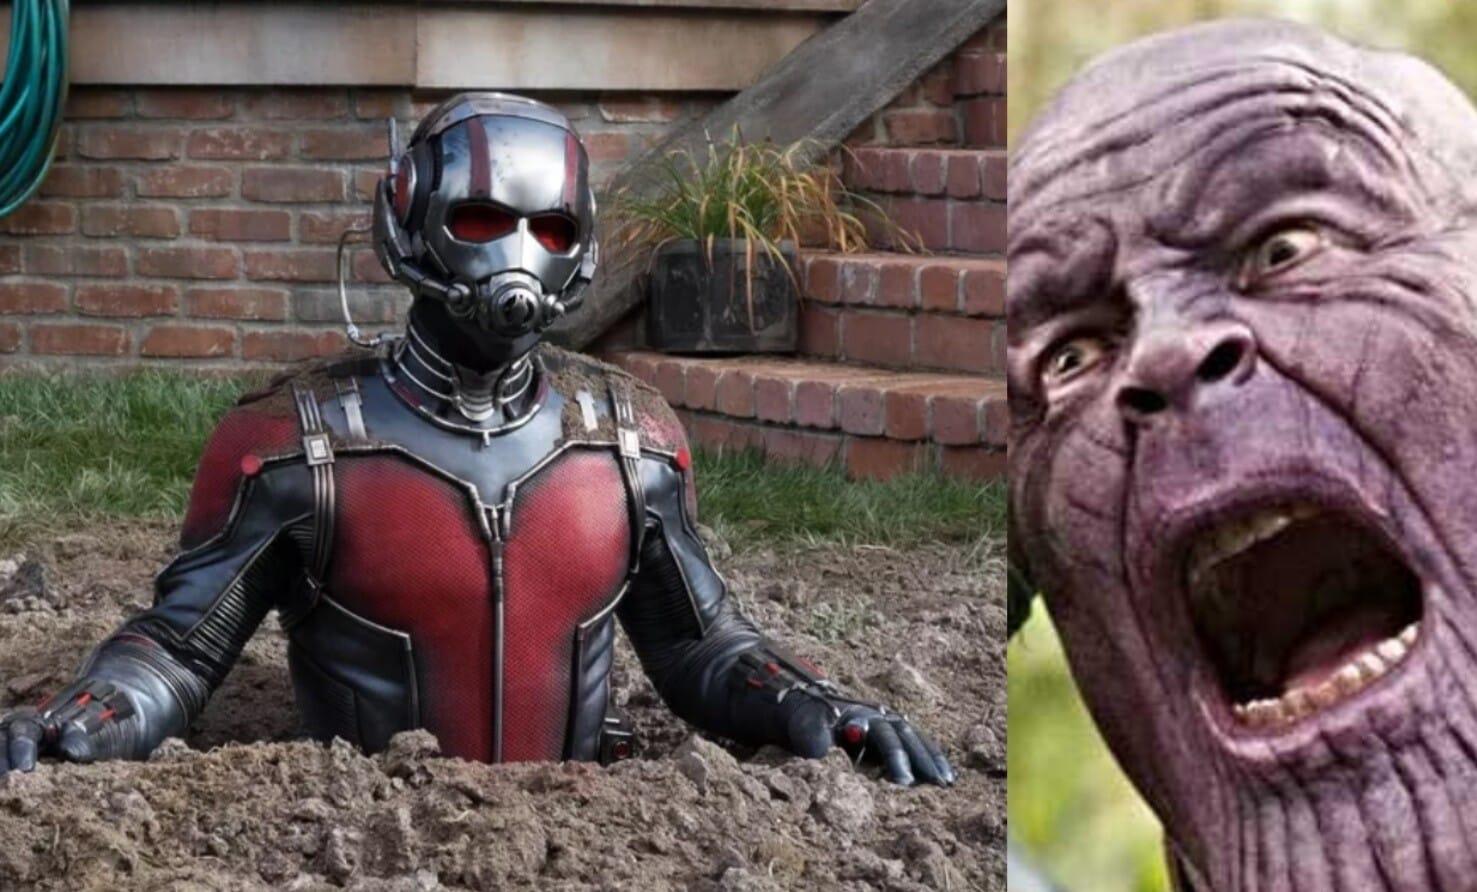 Thanos Vs Iron Man Endgame Memes - Funny Memes 2019